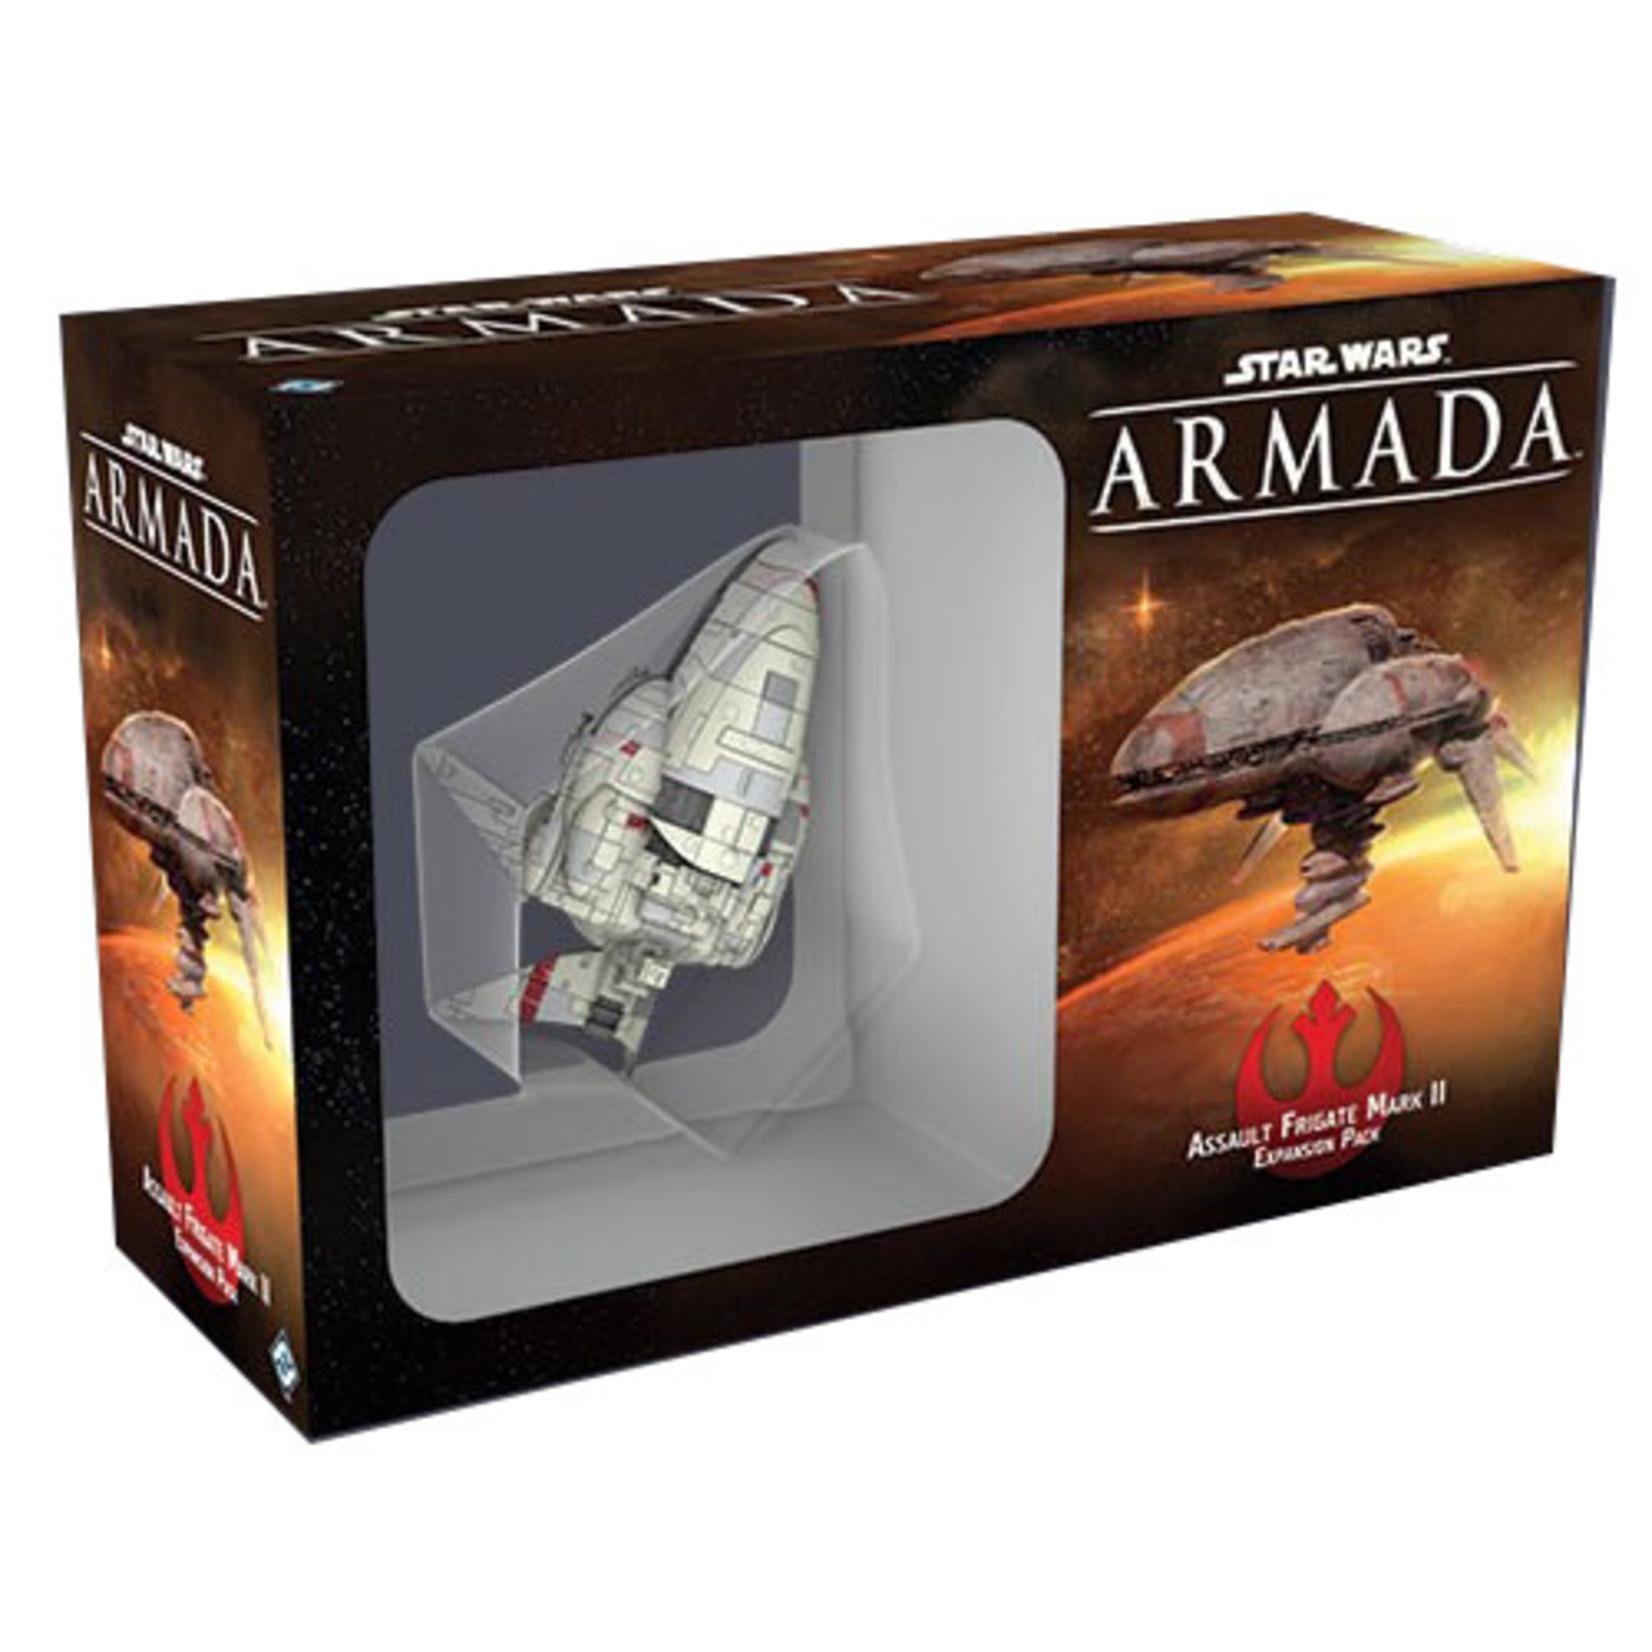 Fantasy Flight Games Assault Frigate Mark II SW Armada Expansion Pack